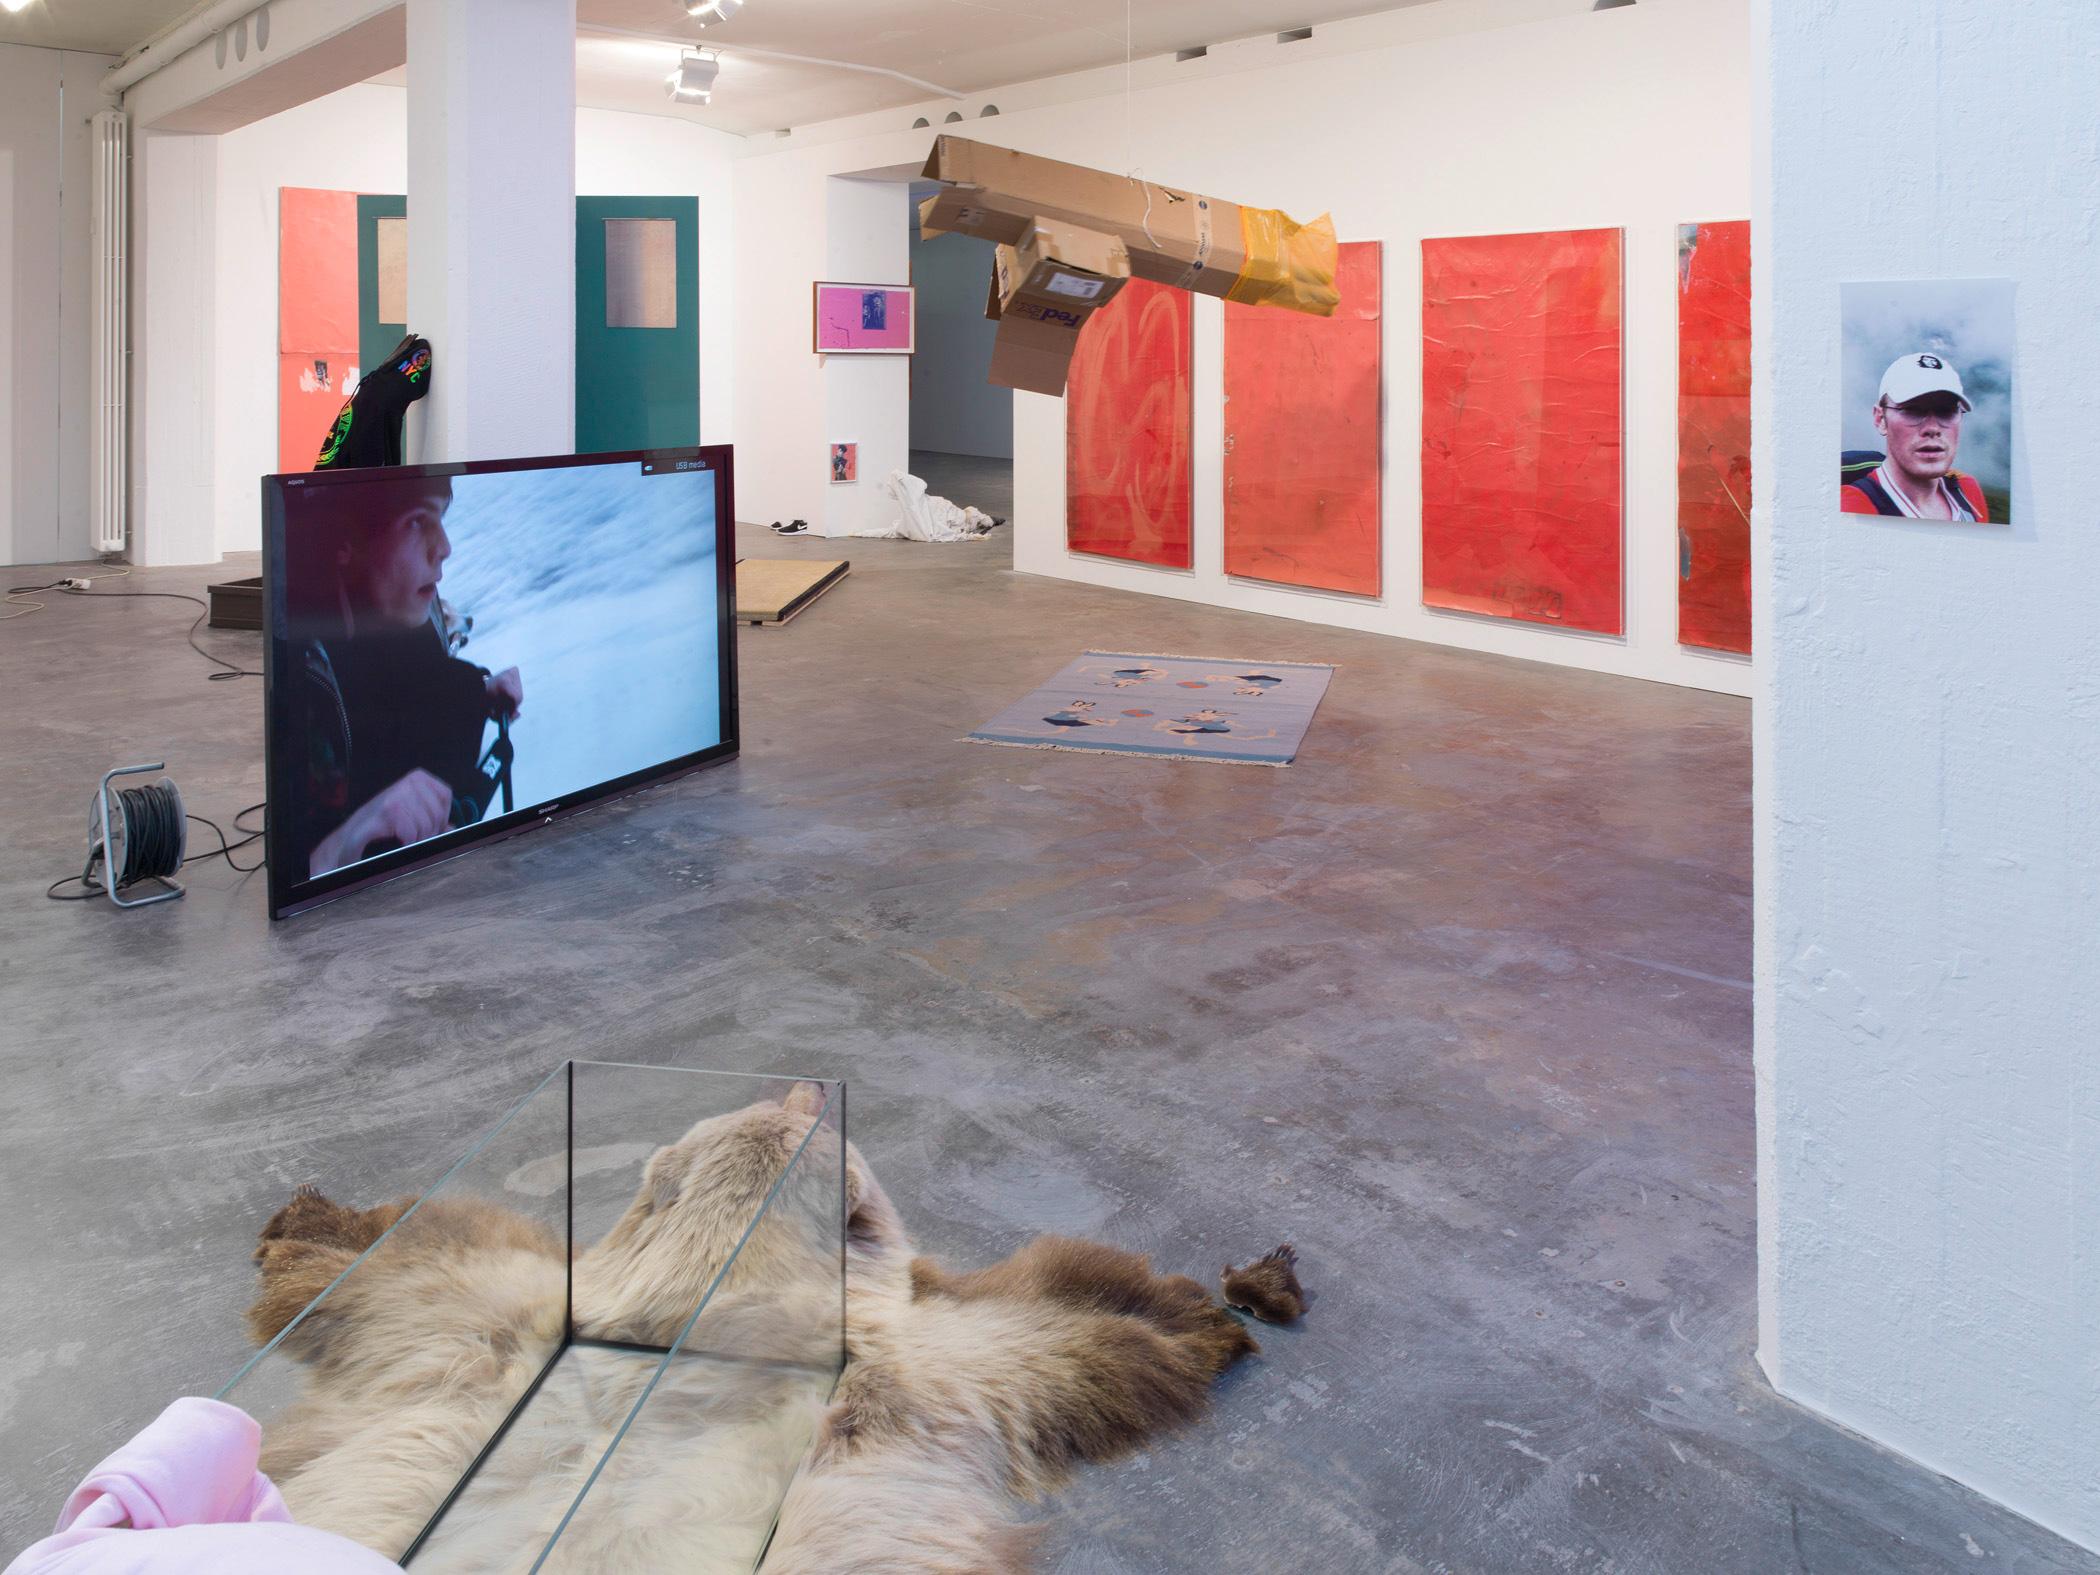 Yves Scherer, Single (2016). Exhibition view. Courtesy Galerie Guido W. Baudach, Berlin.